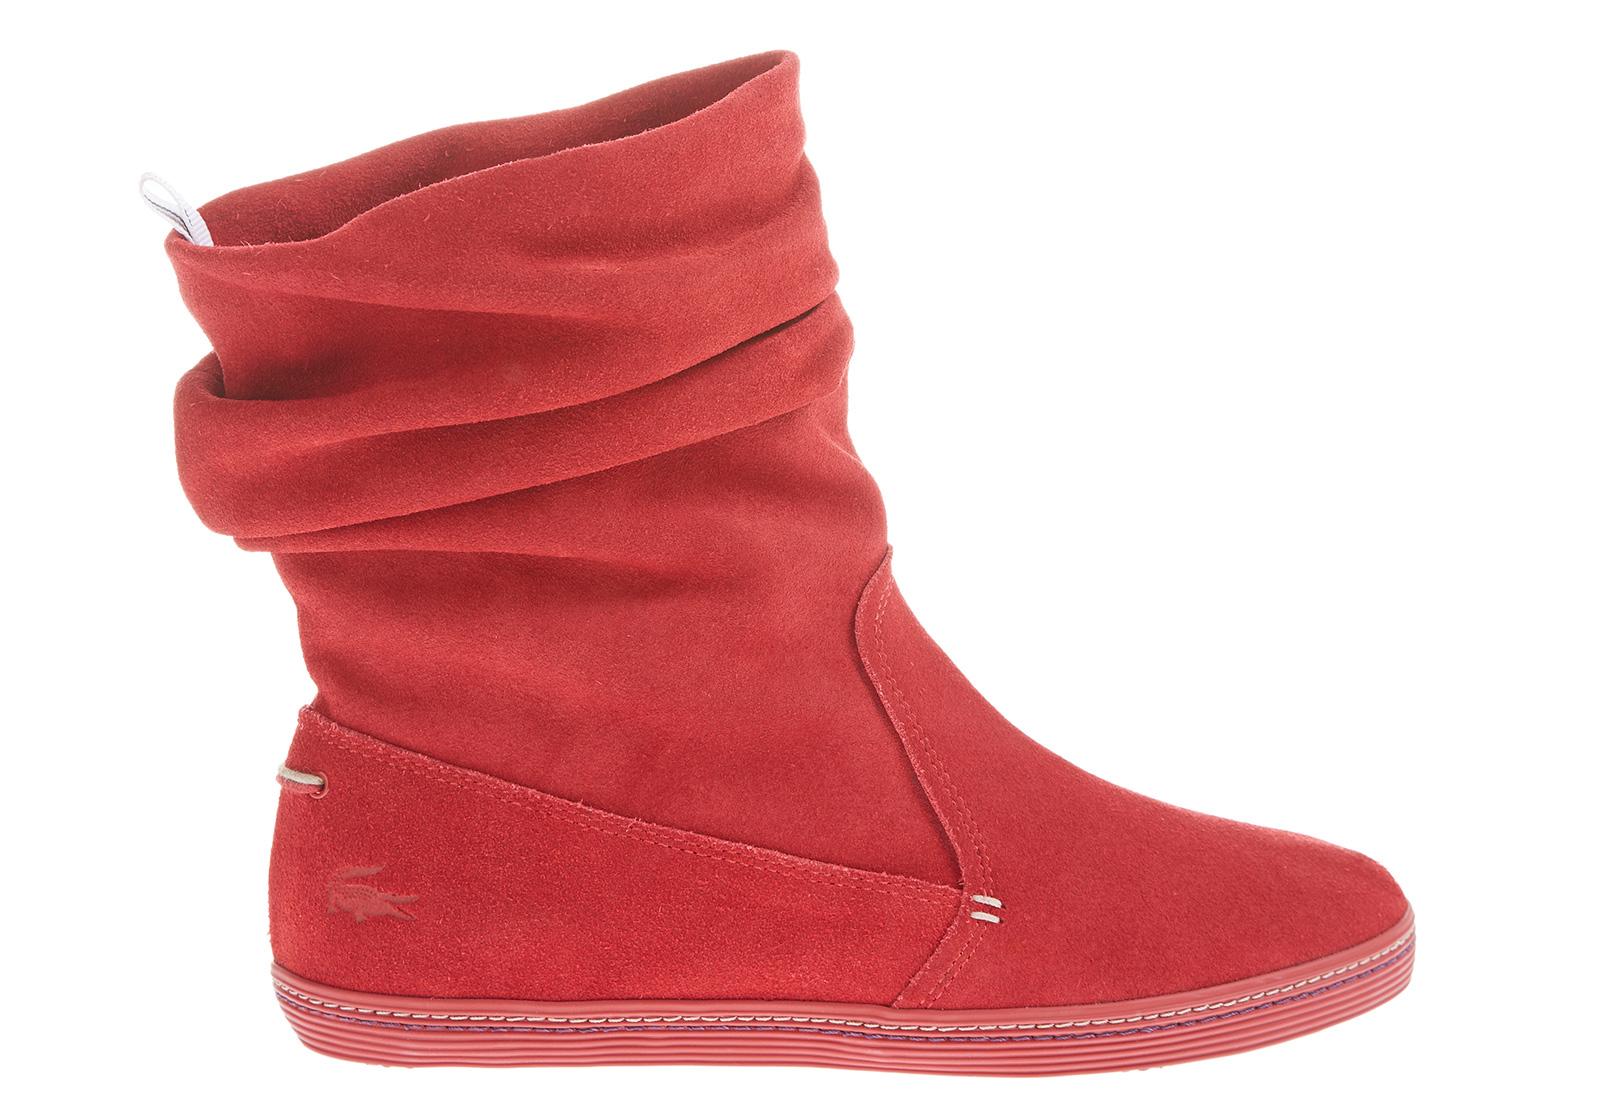 Lacoste Csizma - Sessile - zx-srw4100047 - Office Shoes Magyarország 96a5916a4a